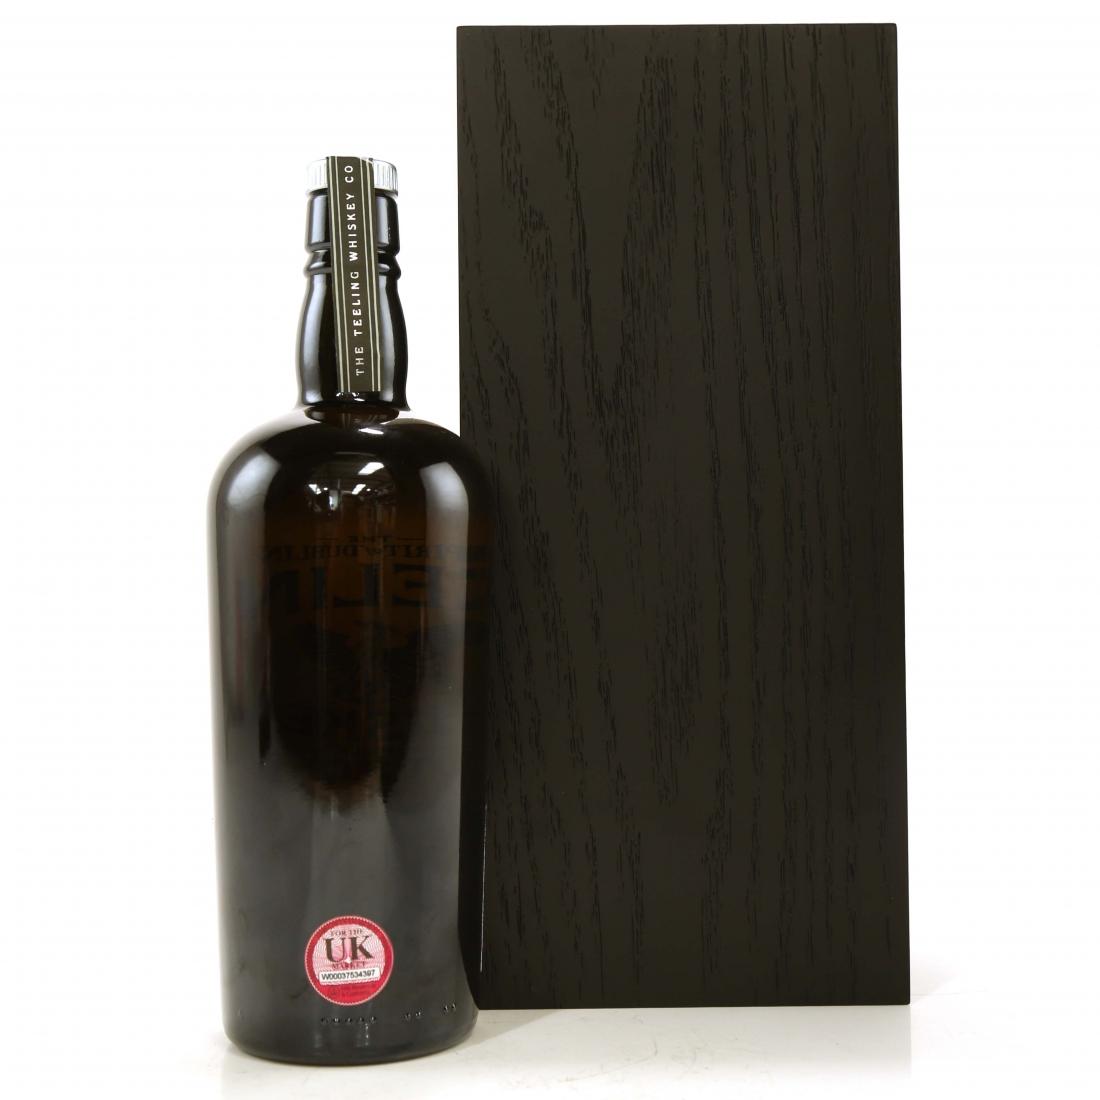 Teeling Celebratory Single Pot Still Whiskey / Bottle #029